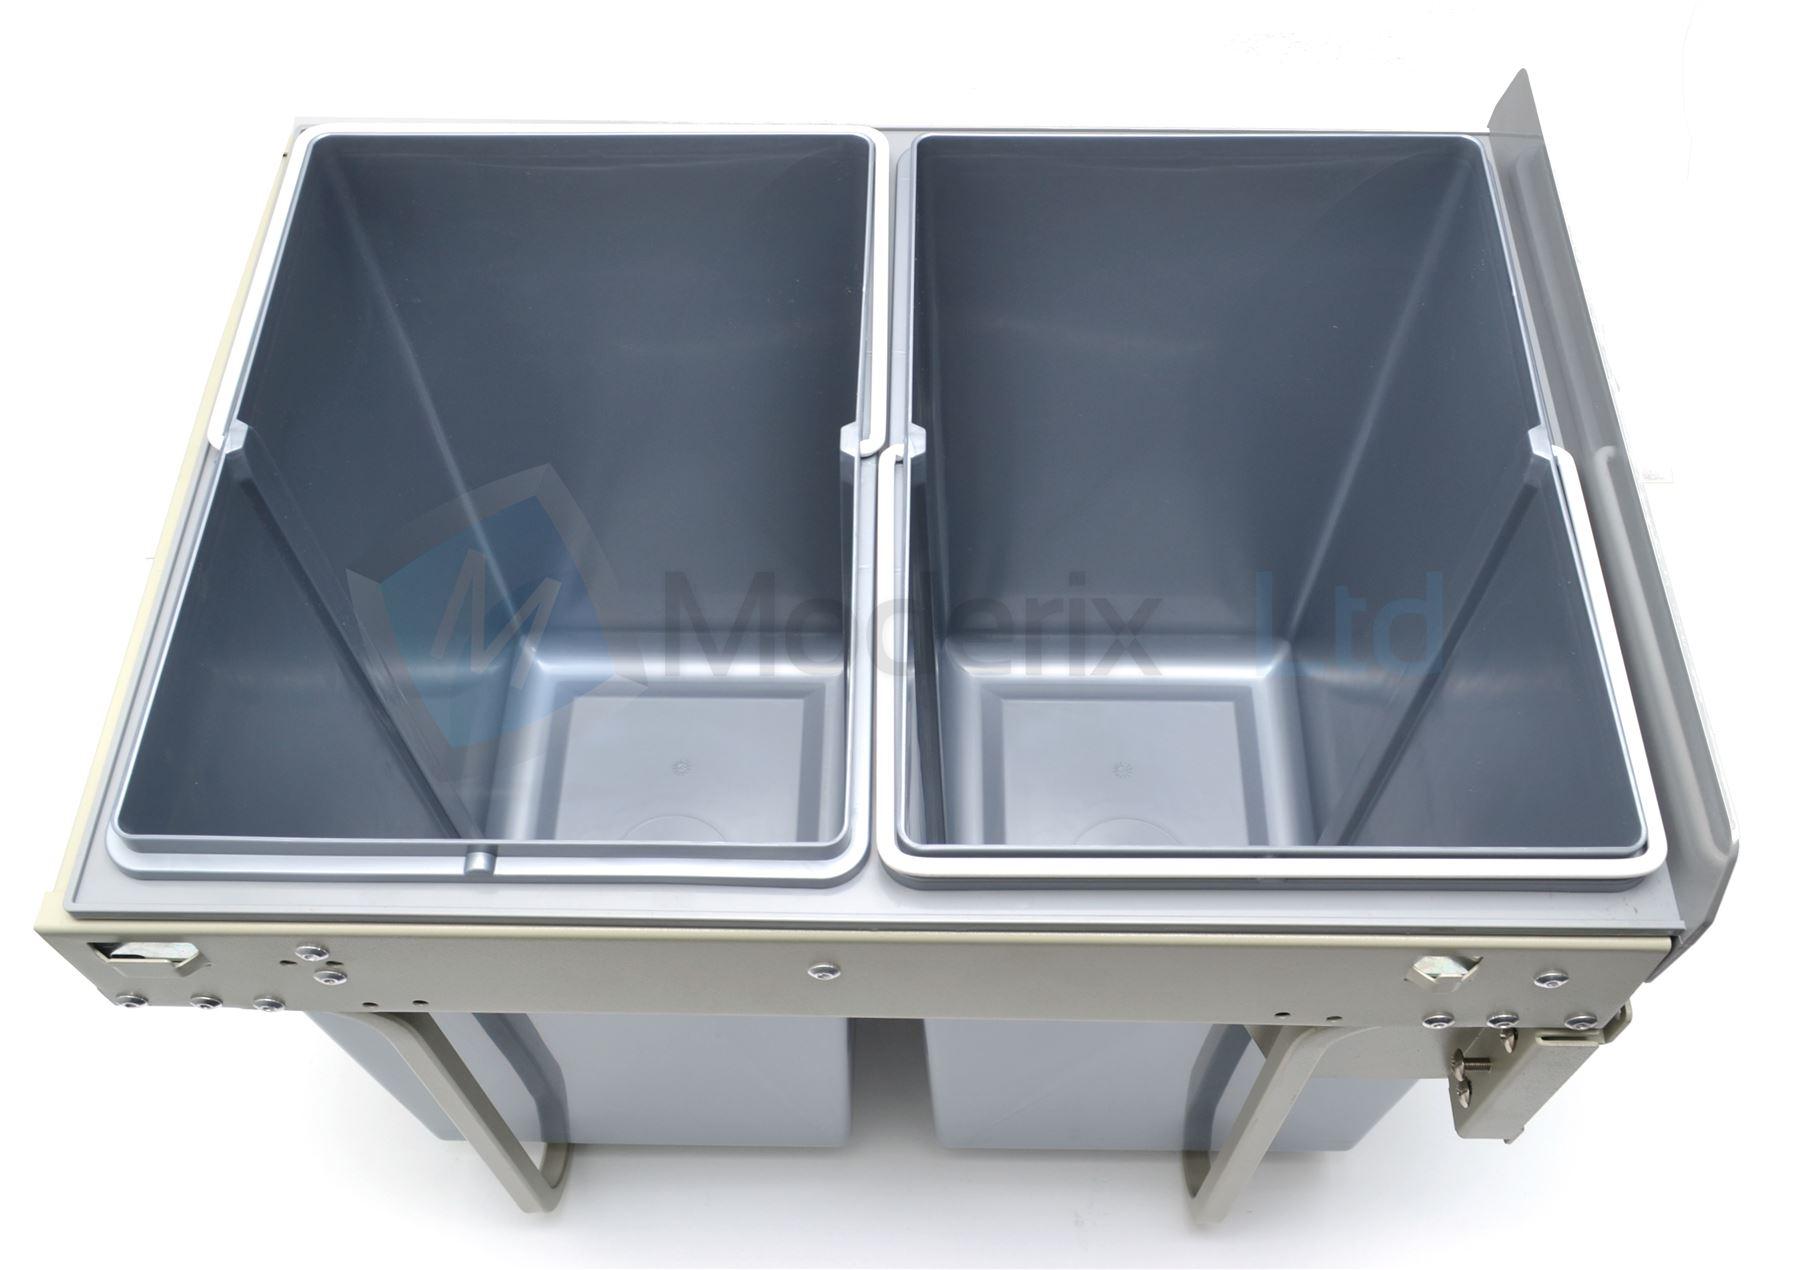 Kitchen Pull Out Plastic Recycling Bin, Waste Bin Full